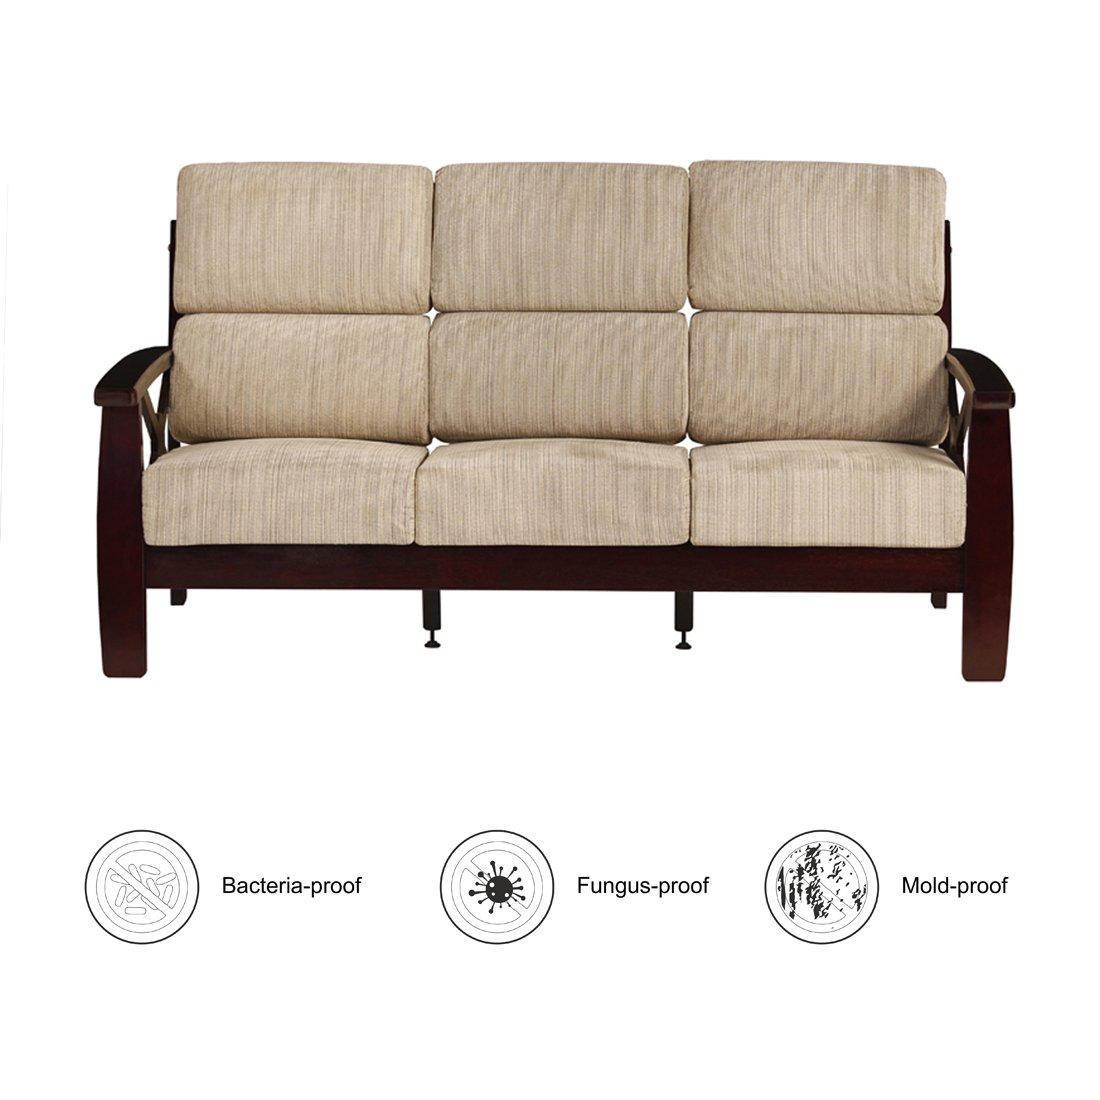 Woodness Austin Classic Three Seater Solid Wood Sofa (Matte, Mahogany)